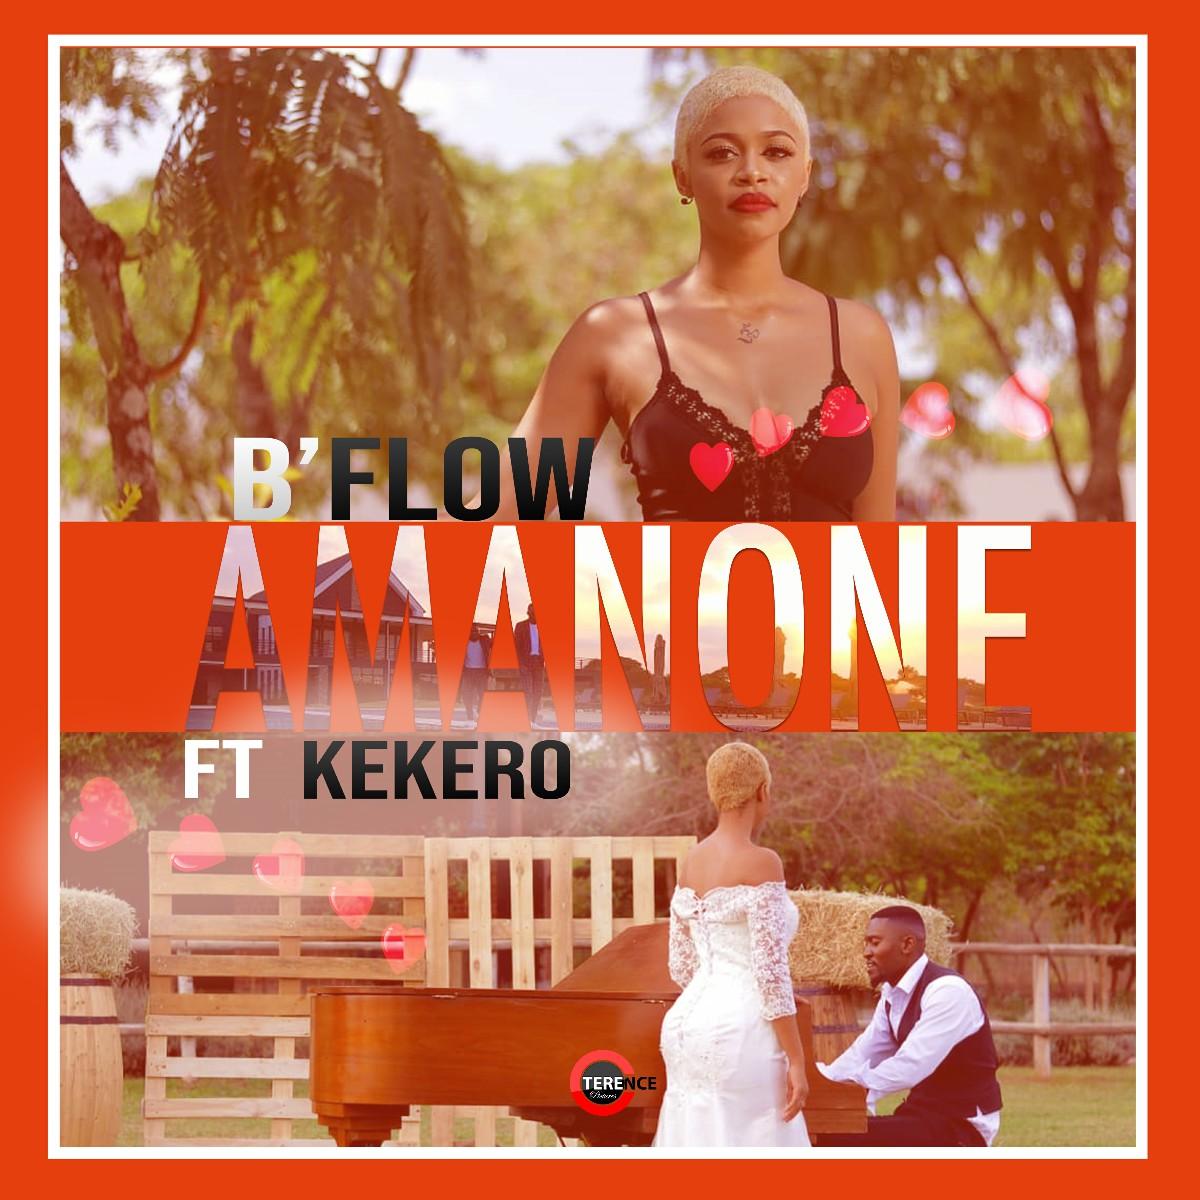 B'Flow ft. Kekero - Amanone